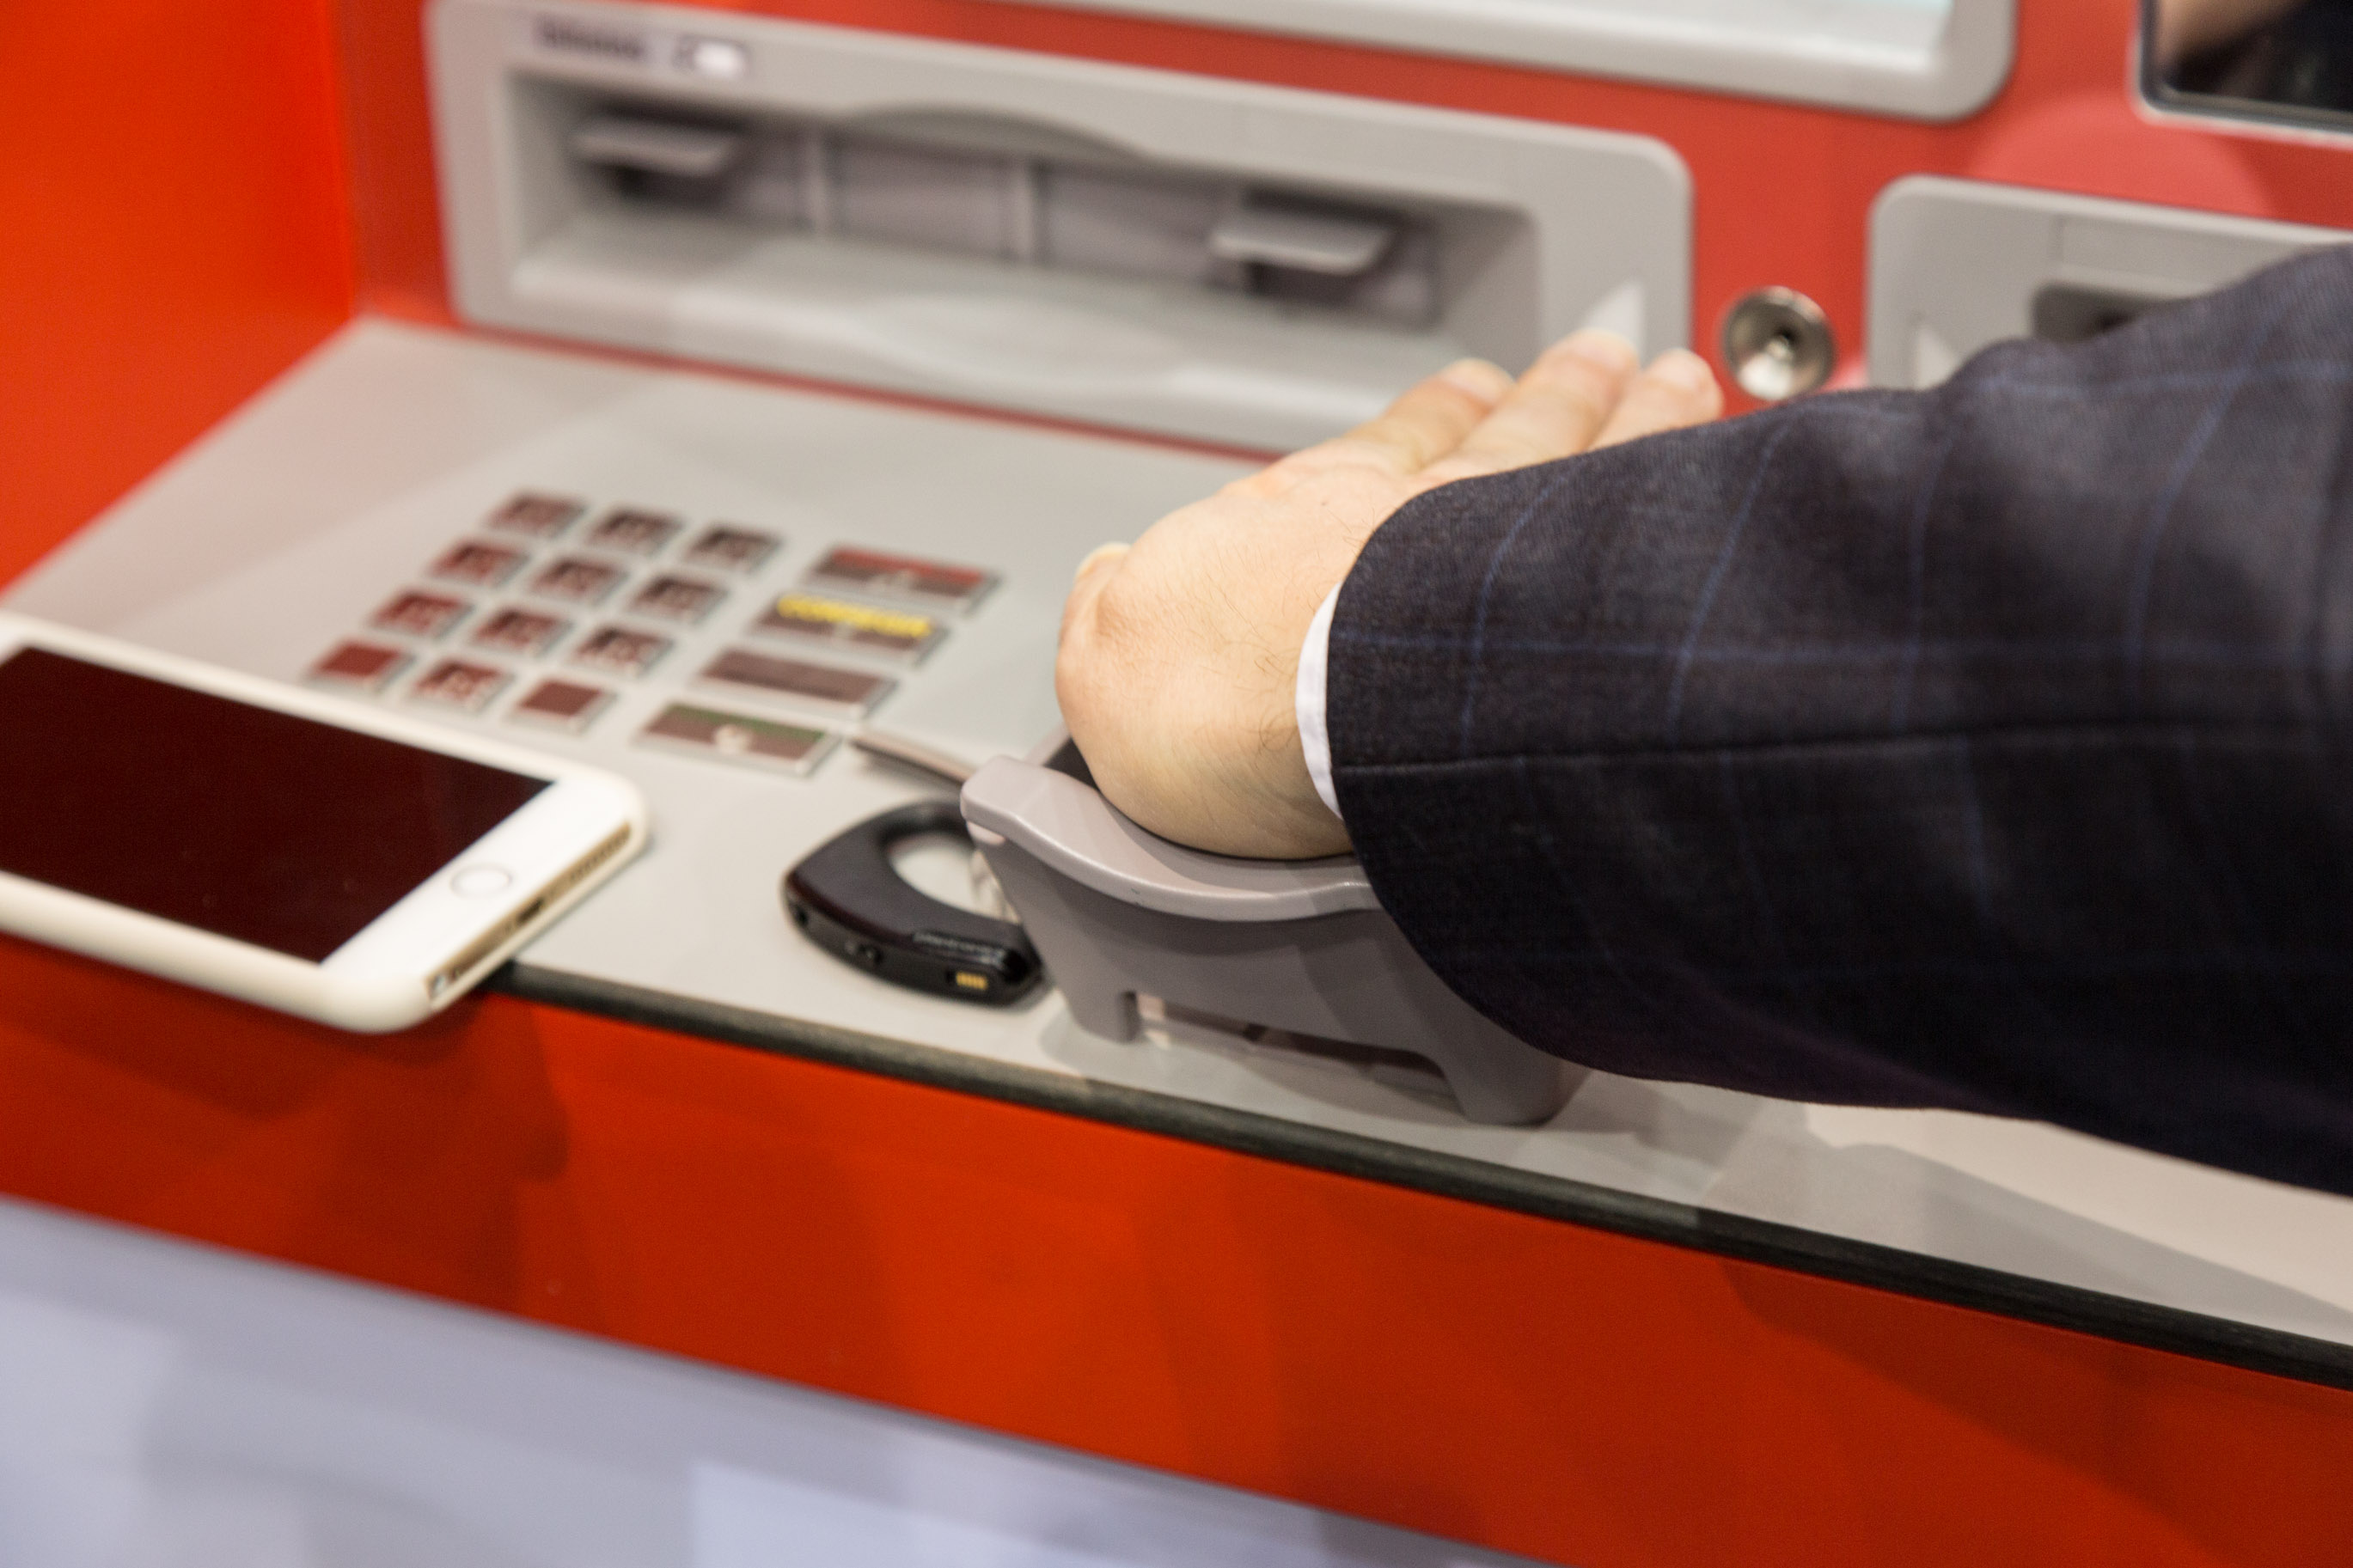 Fujitsu Palmsecure: Venenscan statt Kreditkarte -